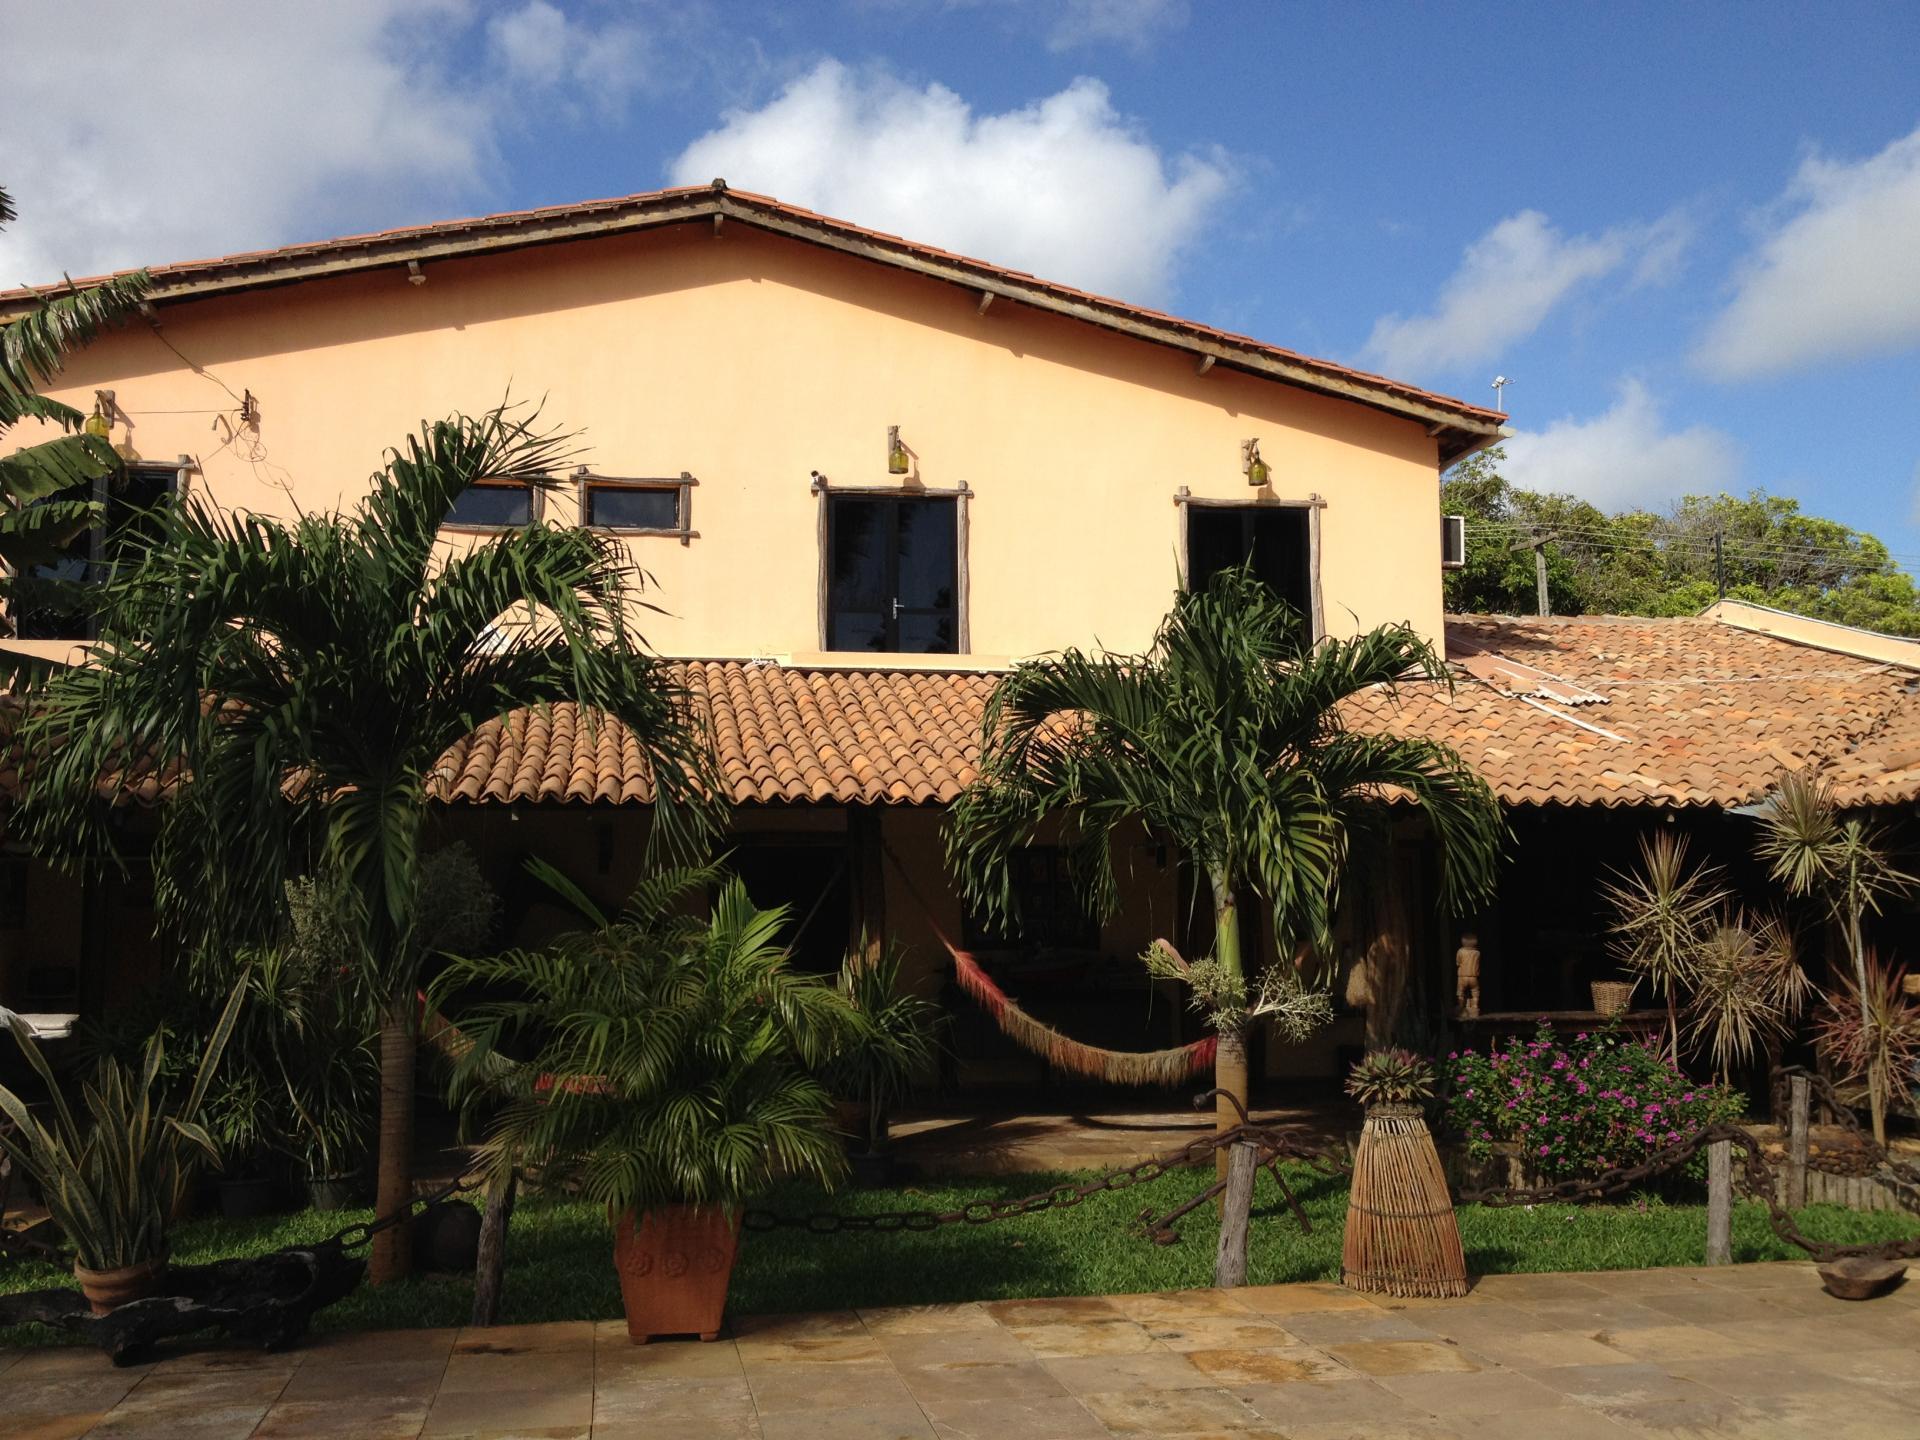 Landestypische Unterkunft Brasilien Lencois Maranhenses Pousada Vila Parnaiba: Gebäude